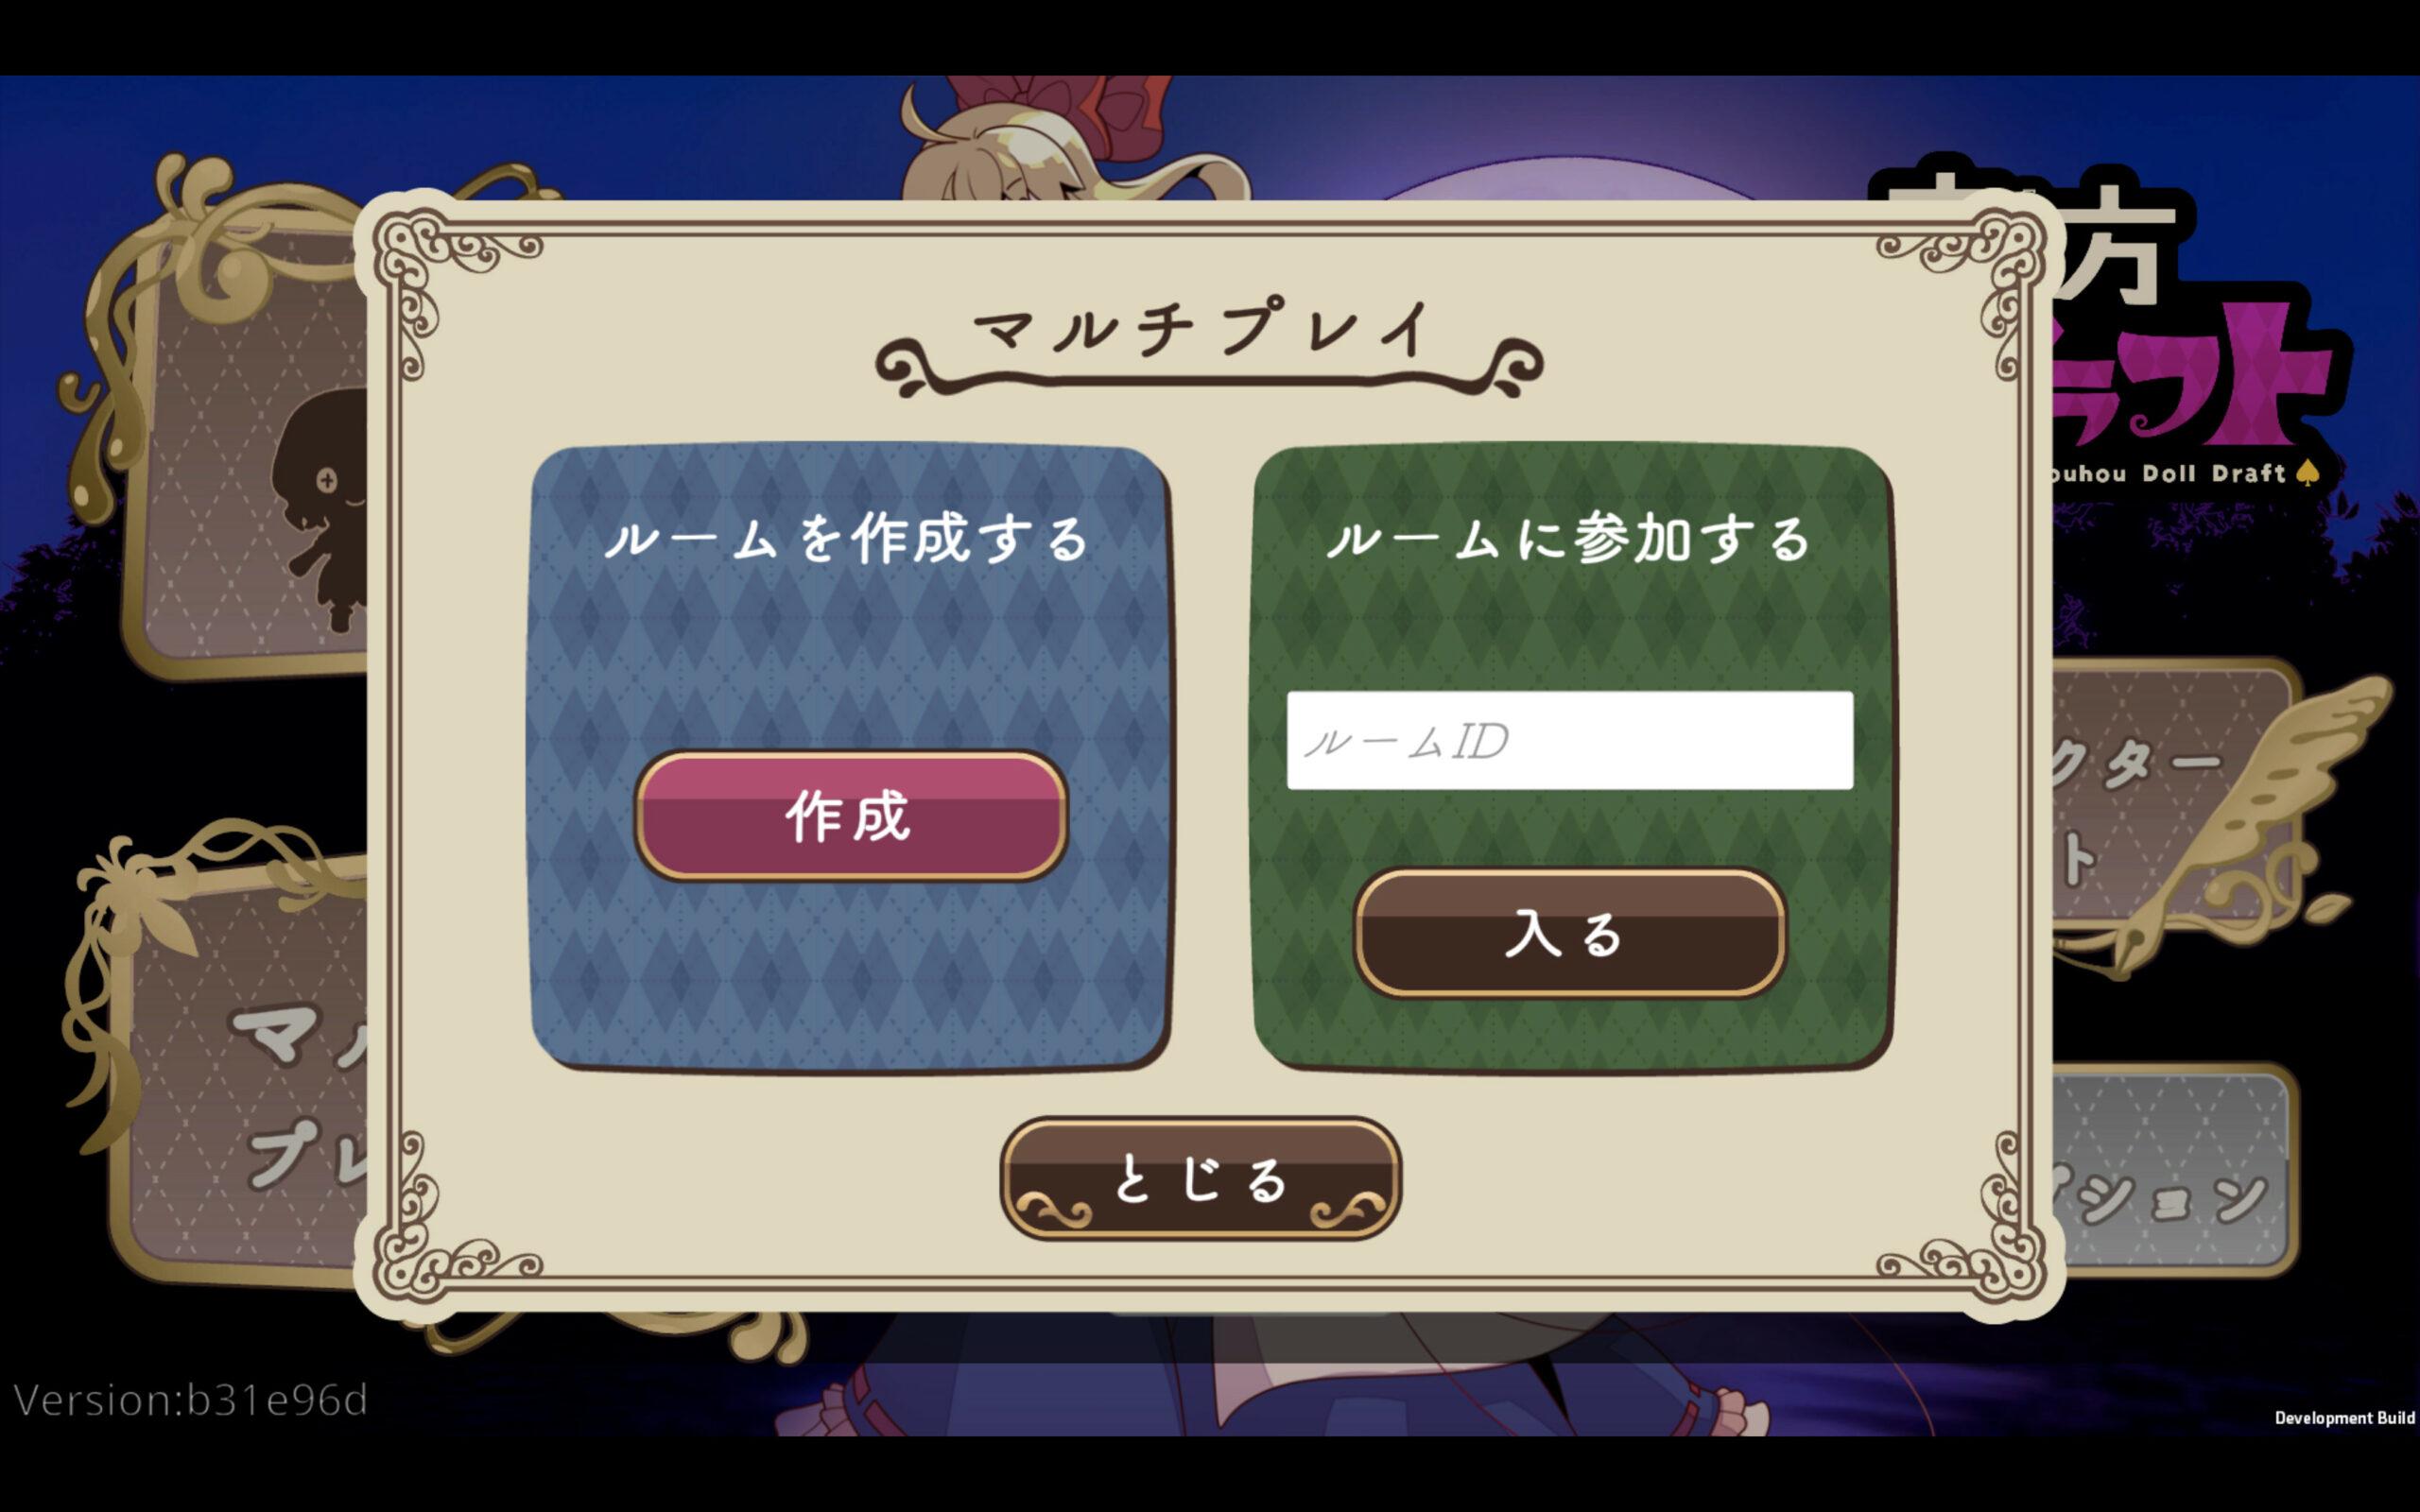 Touhou-DollDraft_2020_11-07-20_002